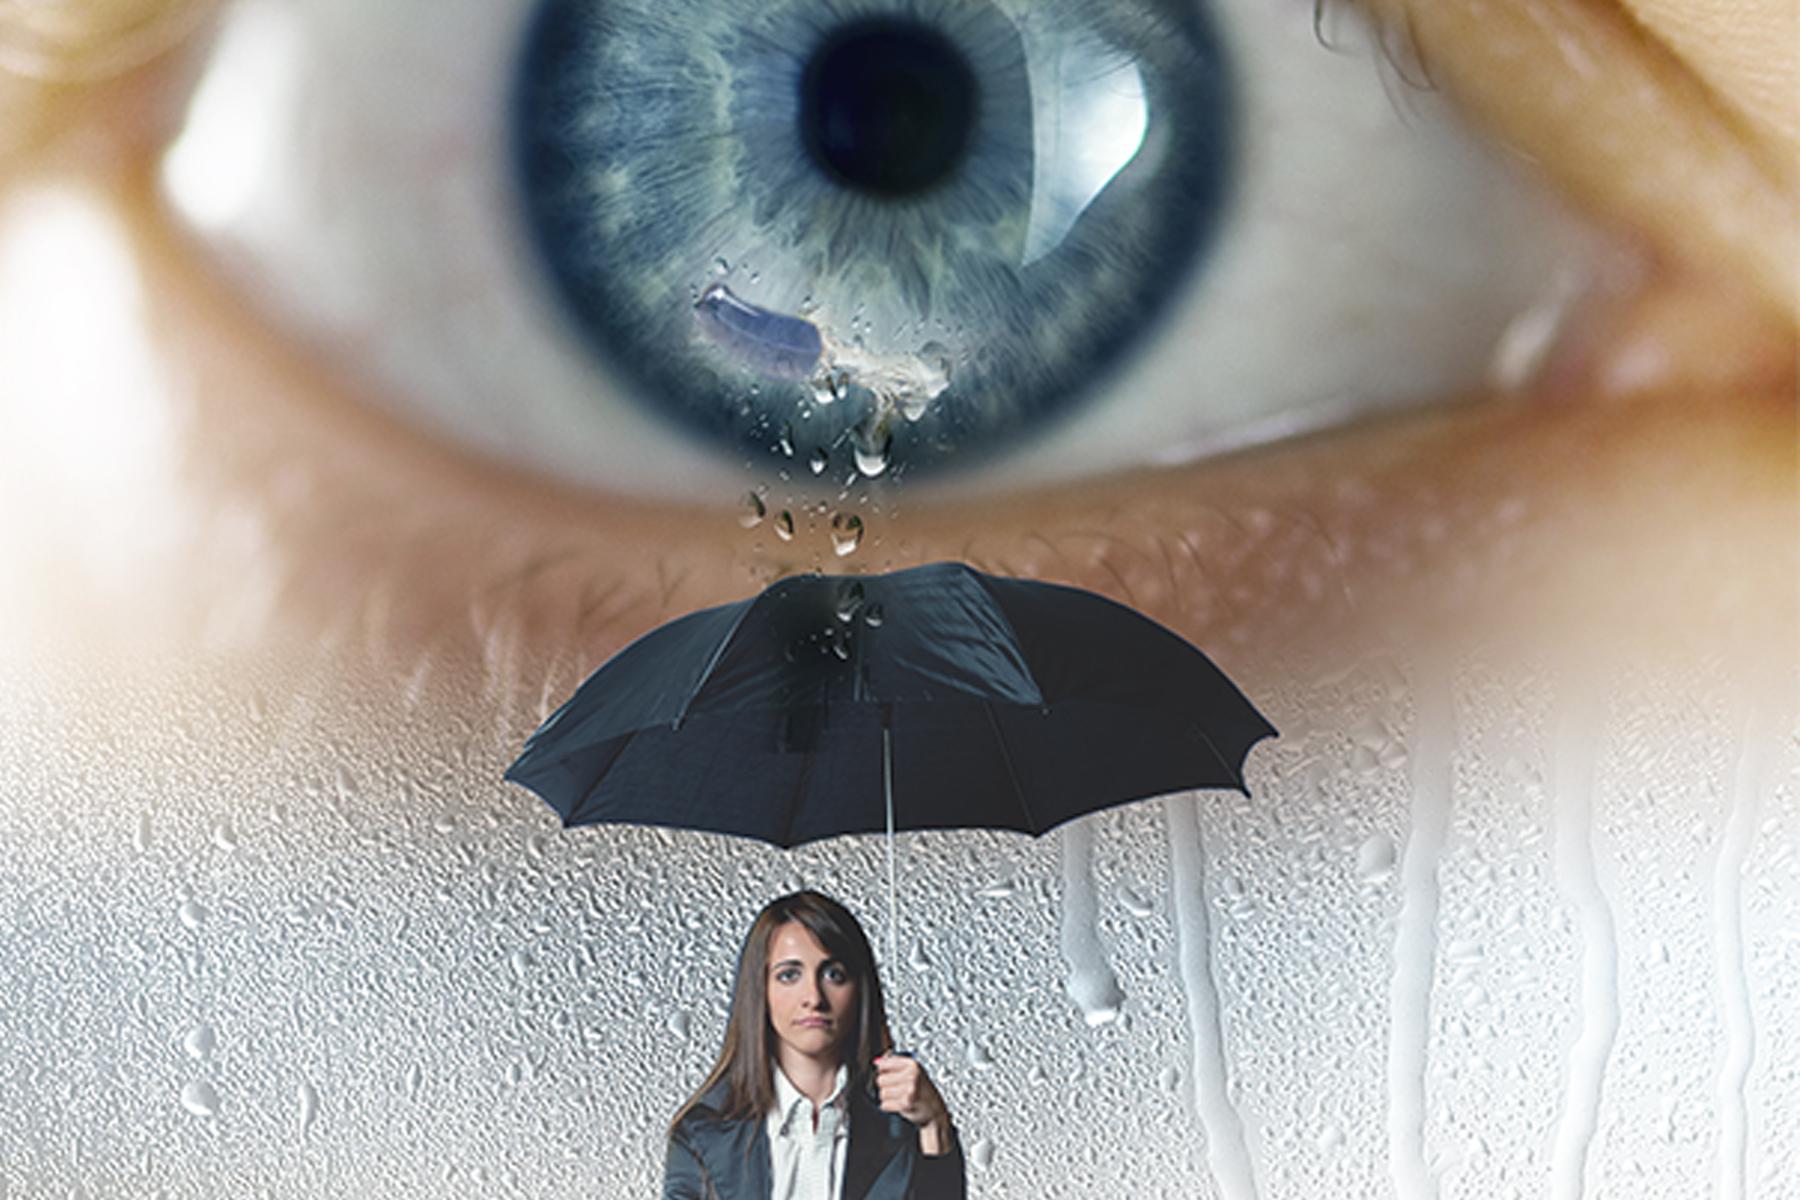 Is Sutureless Cataract Surgery All Wet